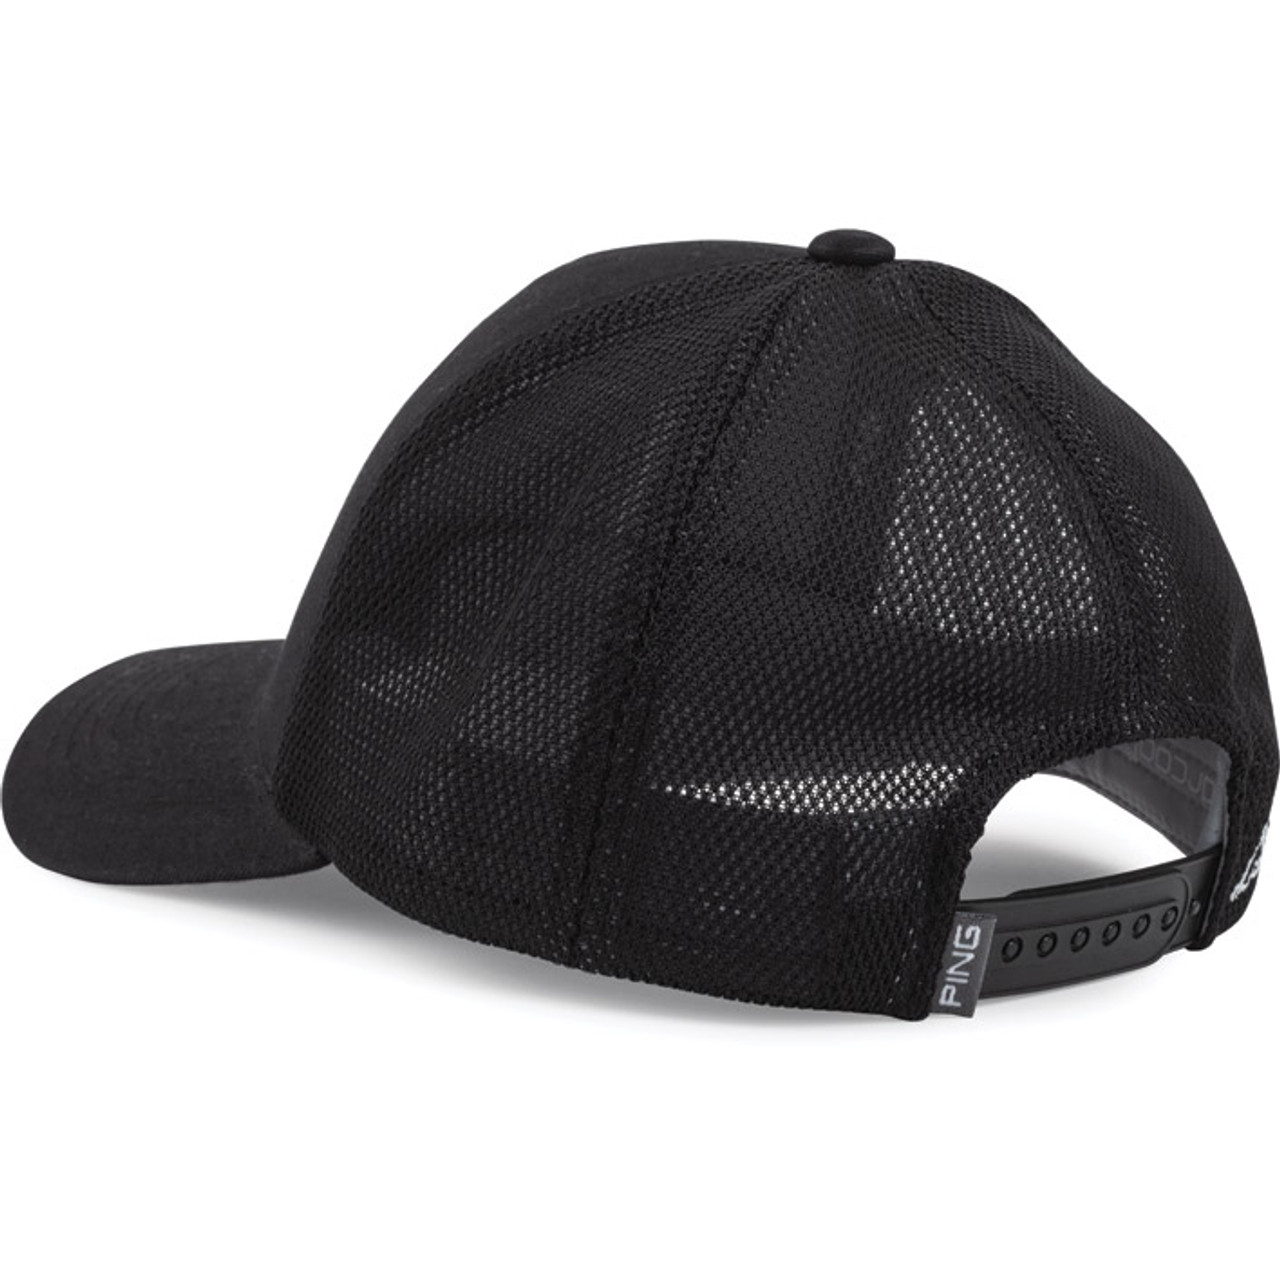 Ping Rollin 59 Cap - Balck